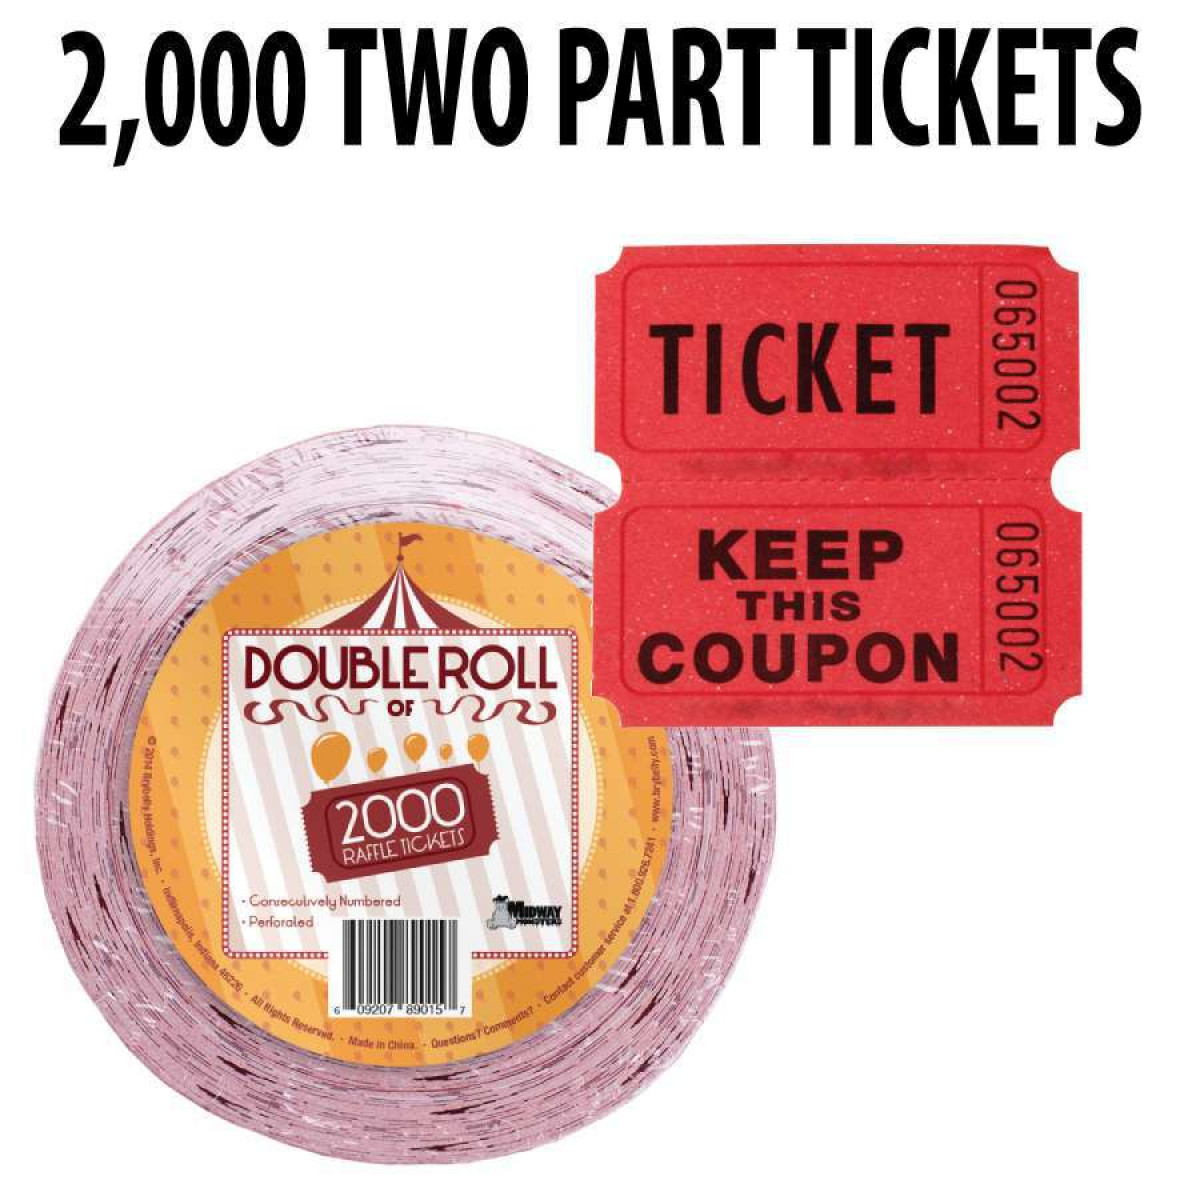 double raffle tickets